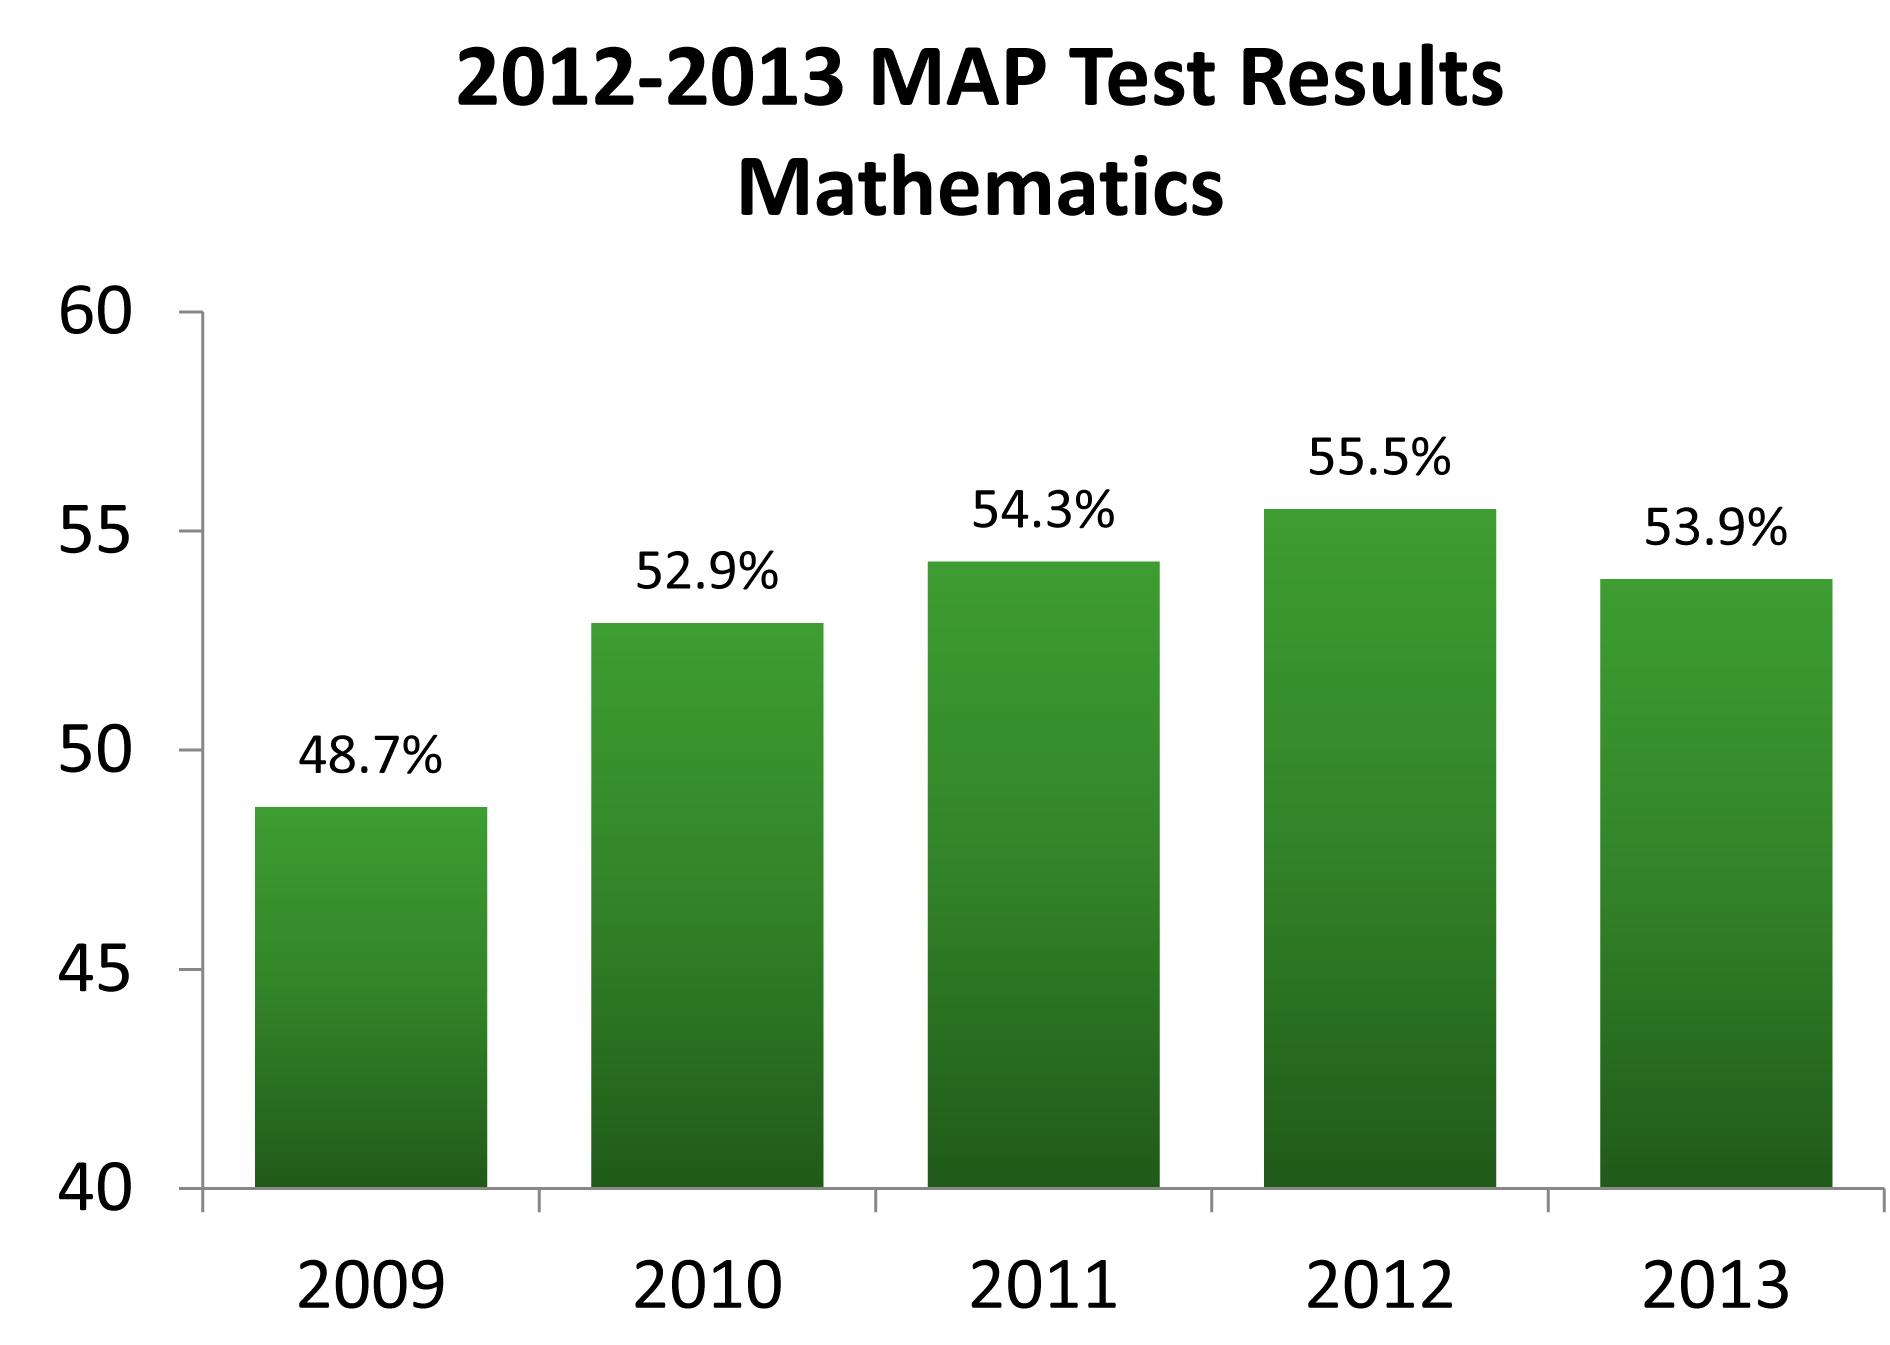 2012-2013 MAP Test Results - Mathematics